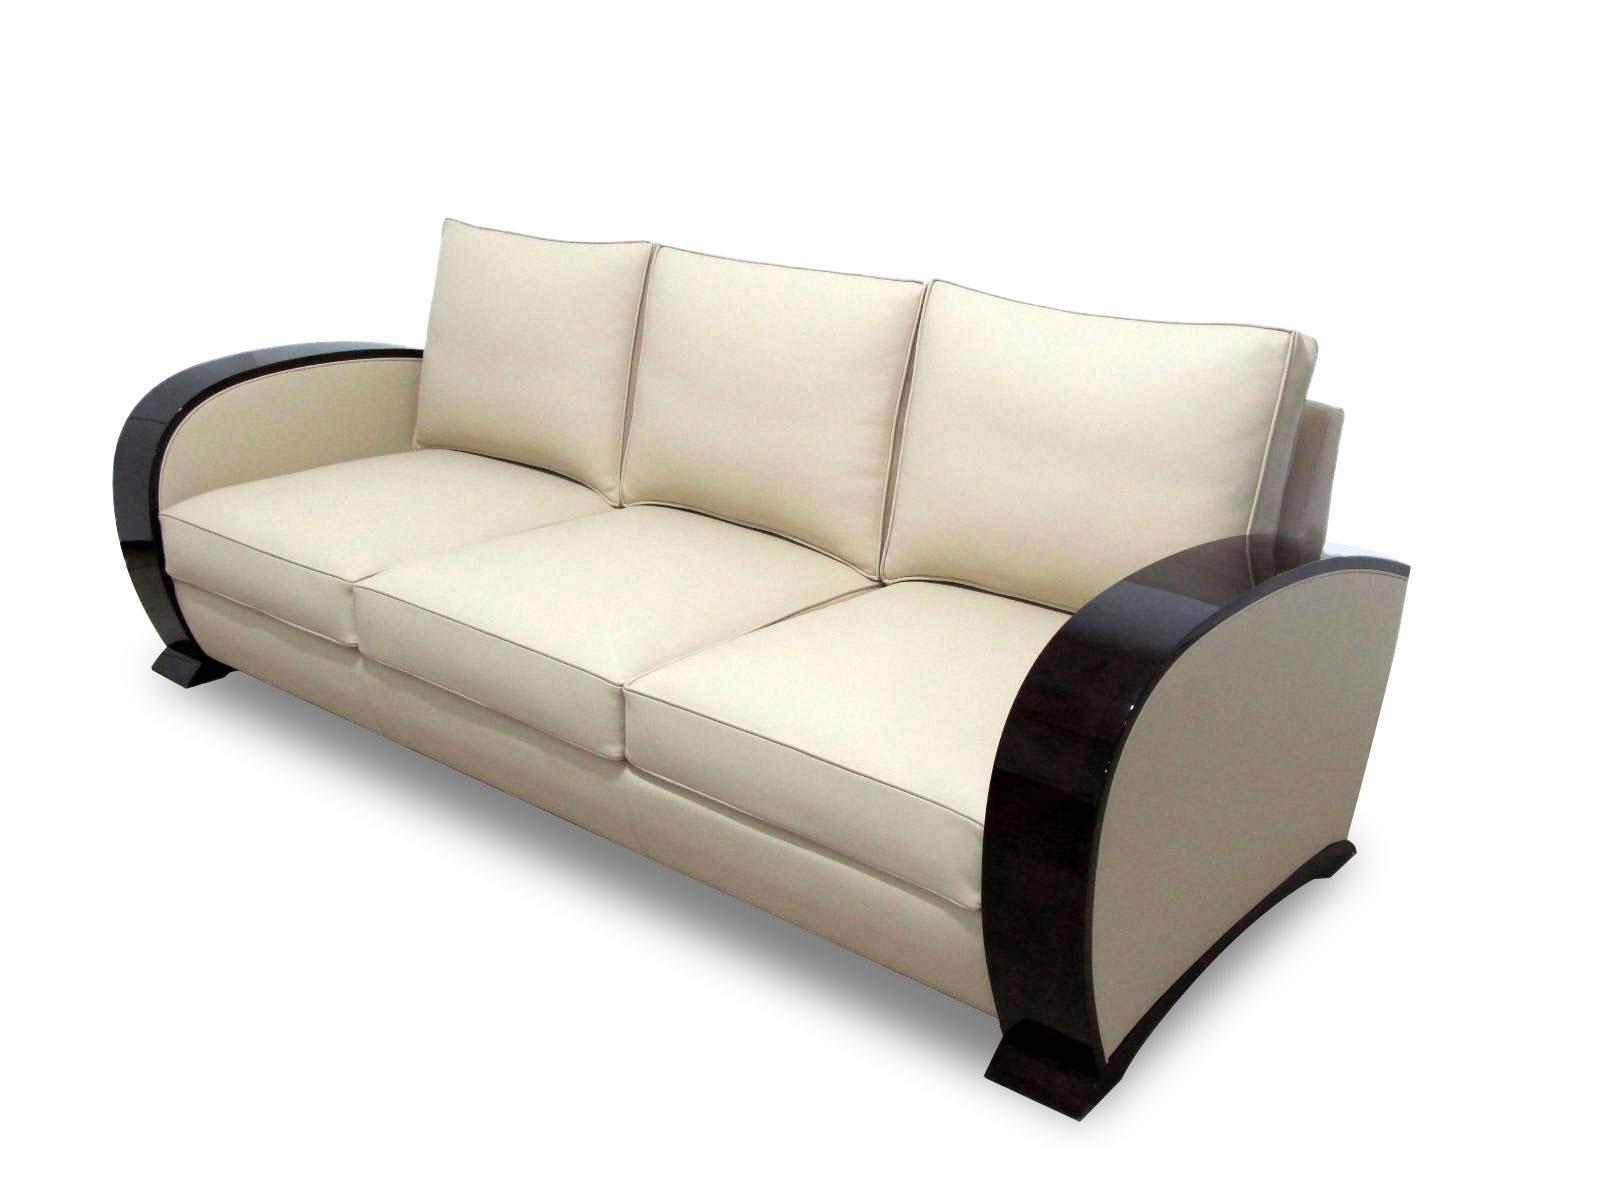 Art Deco Furniture - Hifigeny Custom Furniture inside Art Deco Sofas (Image 2 of 10)